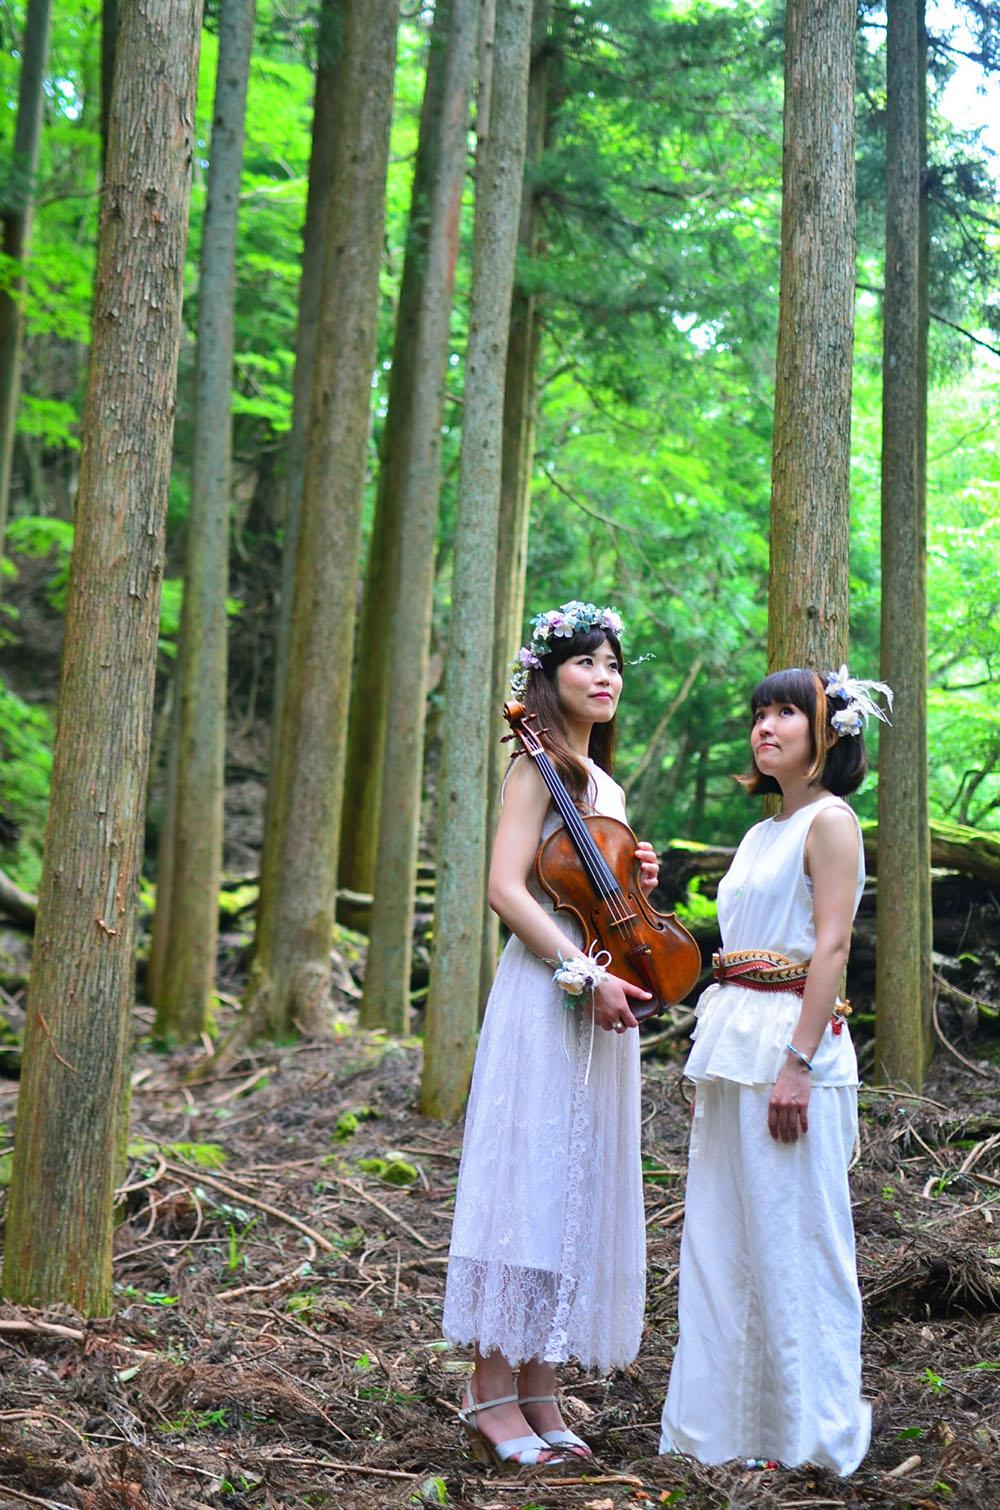 MARIERIKA Valentine Lunch &#038; Concert<br />(マリエリカ バレンタイン ランチ&コンサート )